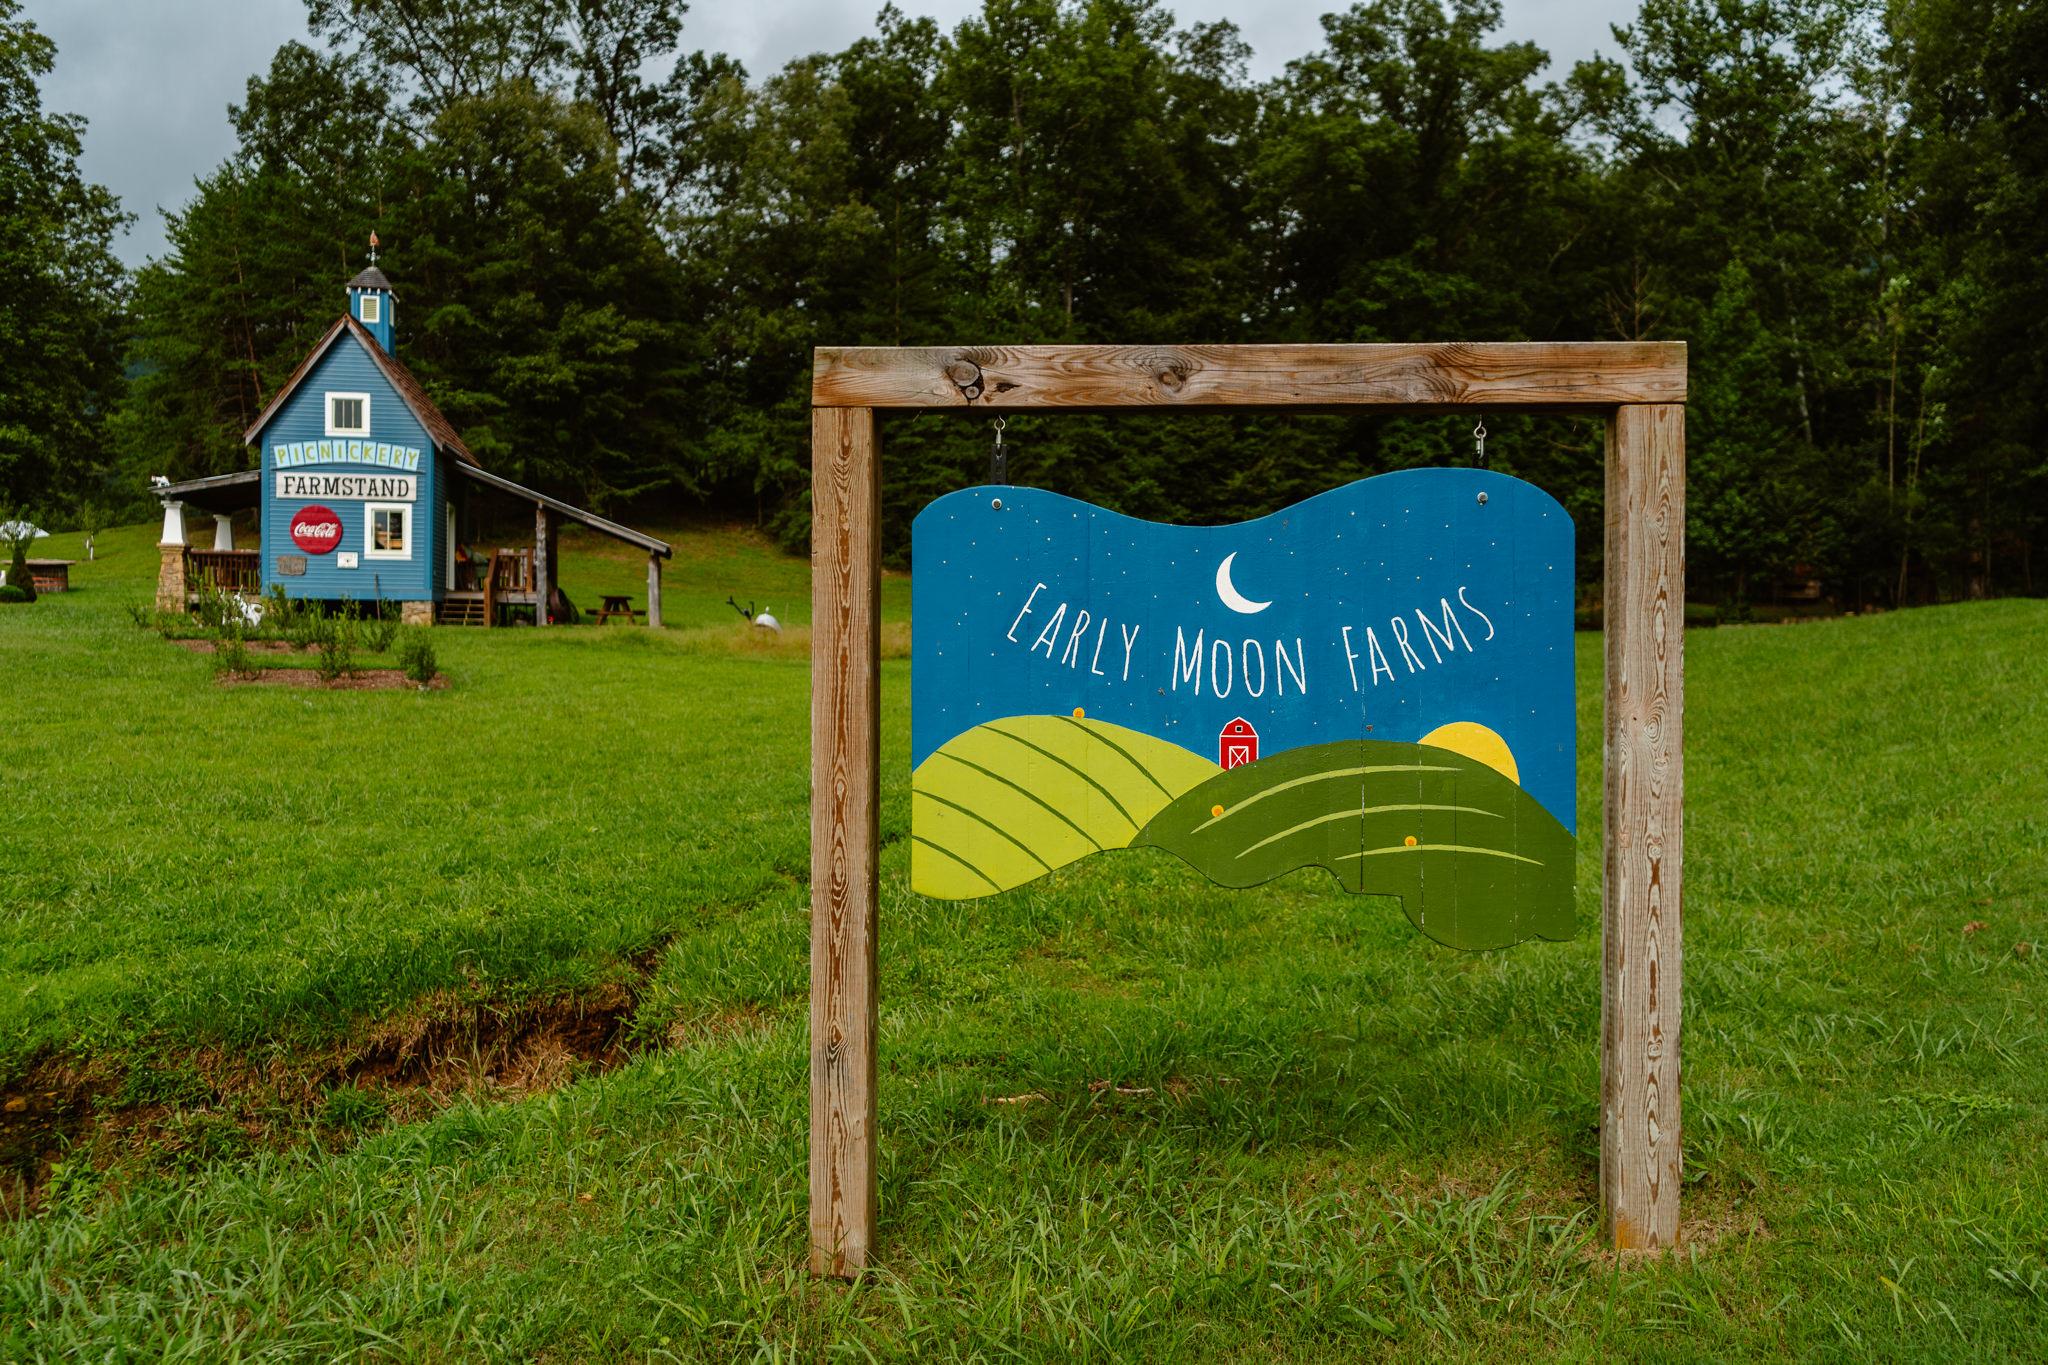 Early Moon Farms